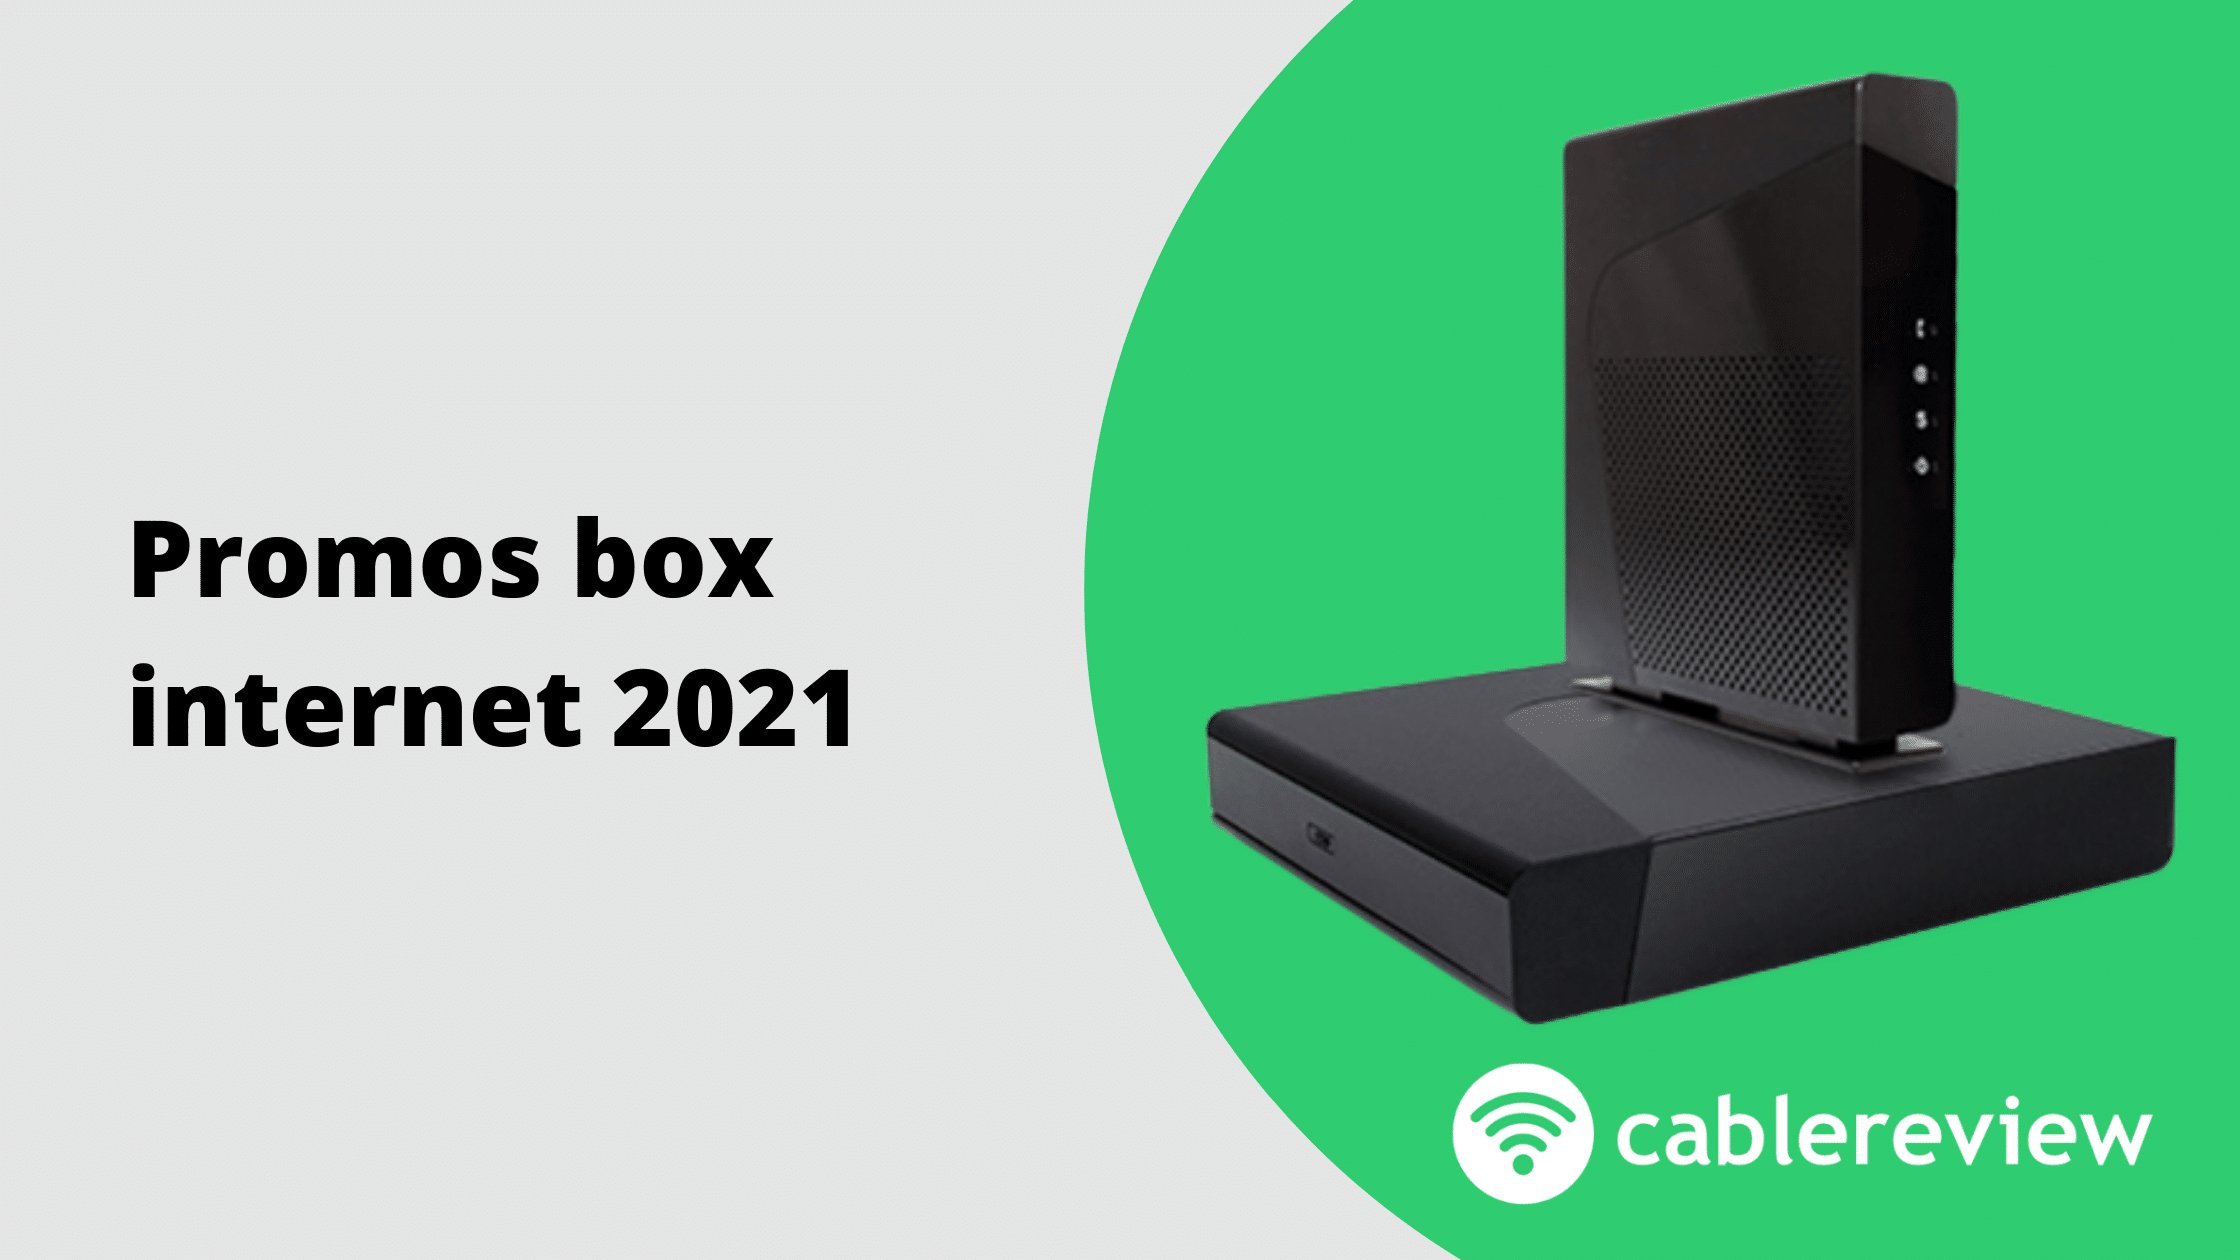 Promos box internet 2021